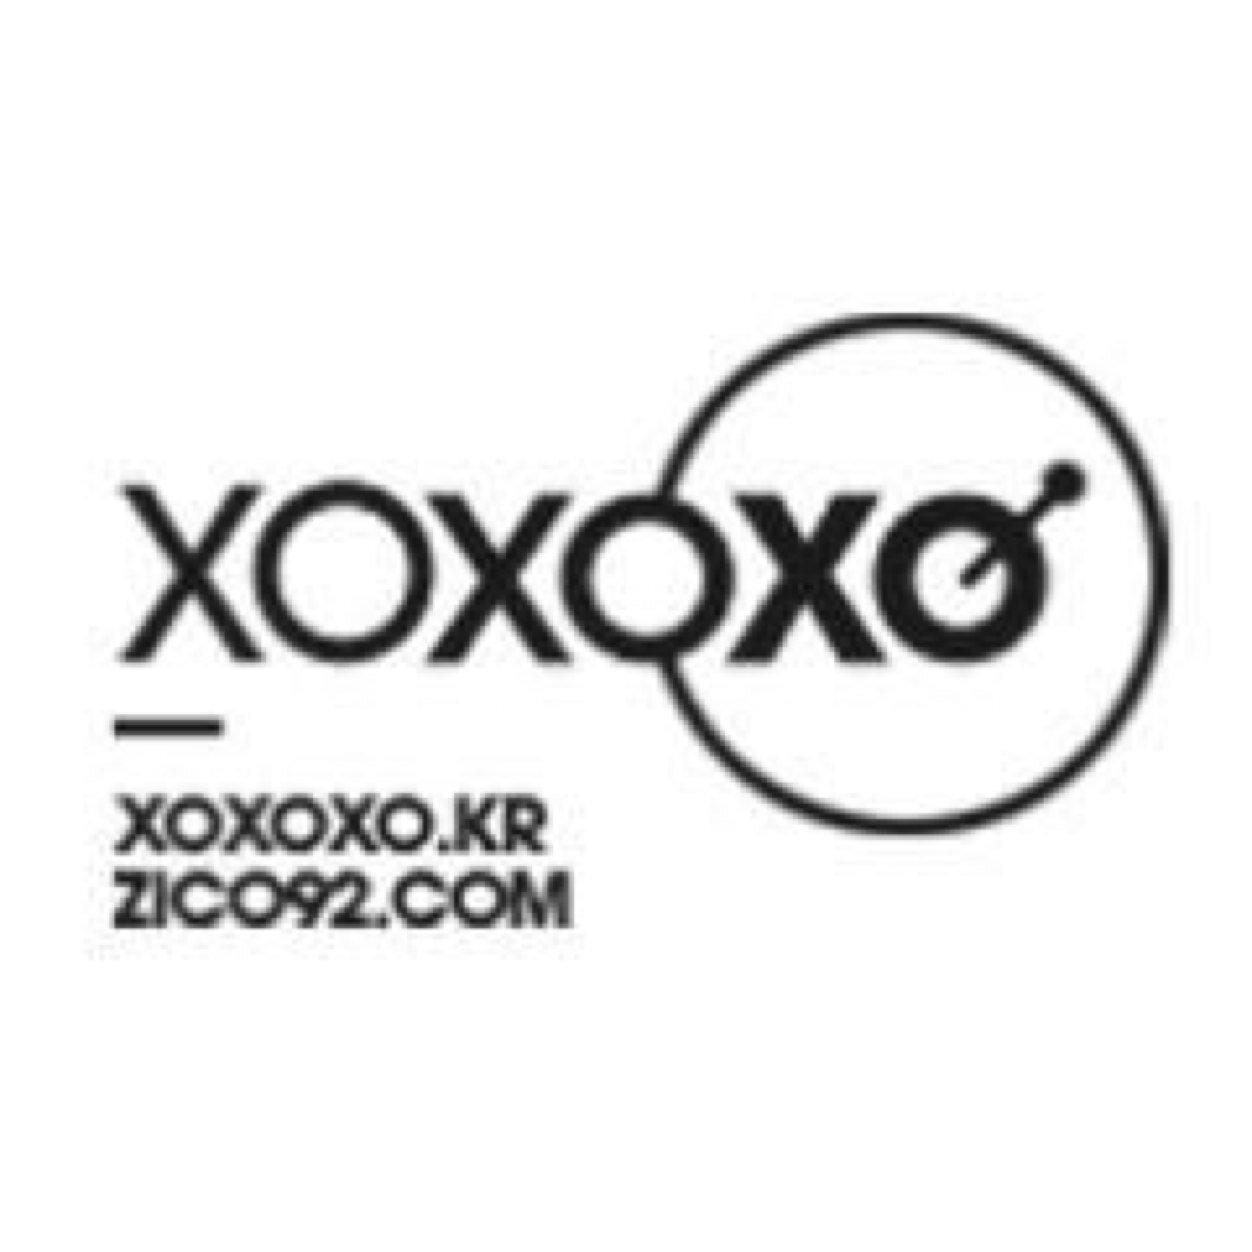 XOXOXO (@xoxoxo_kr) | Twitter